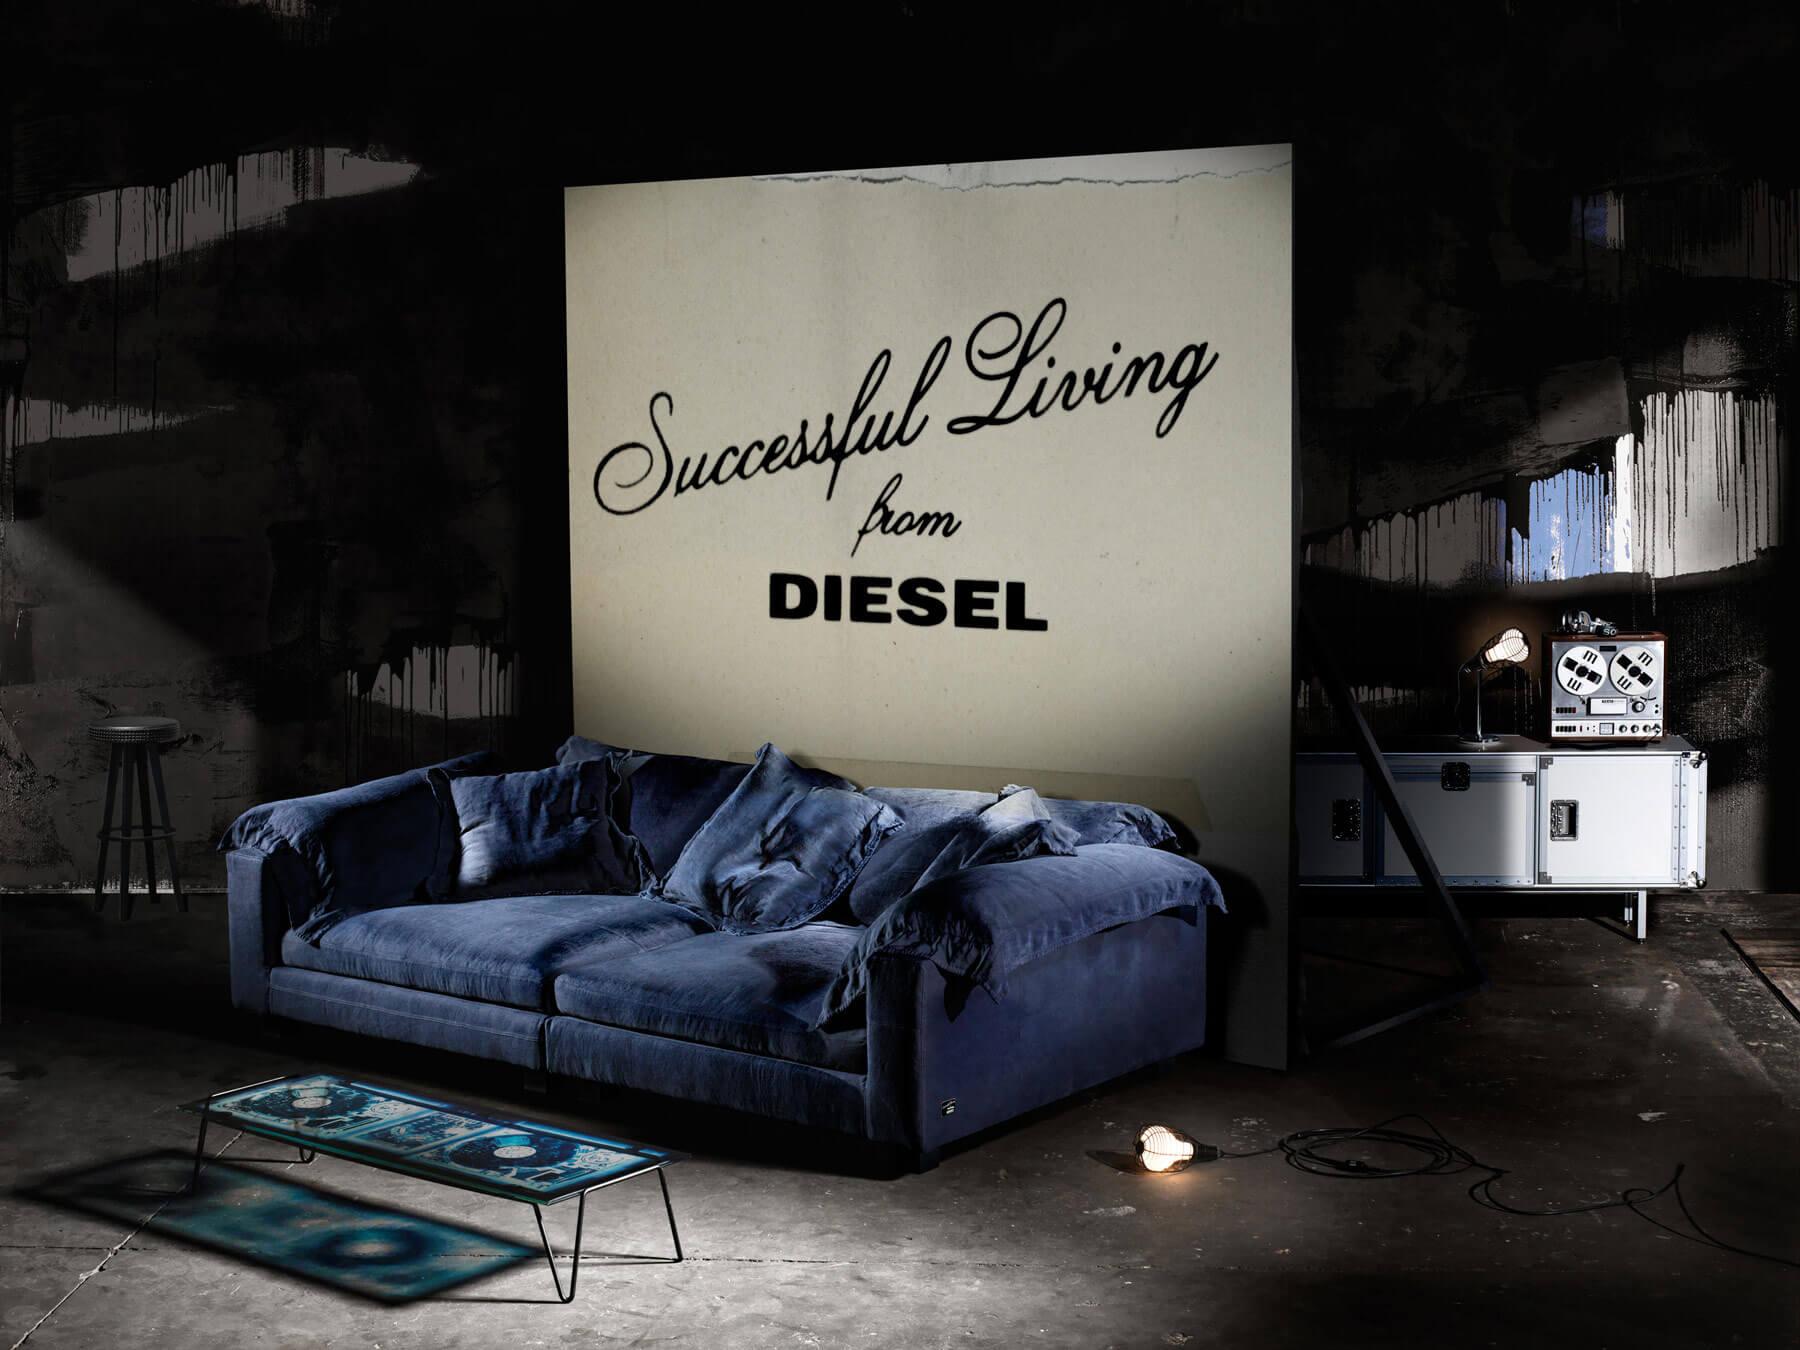 divano diesel creative team